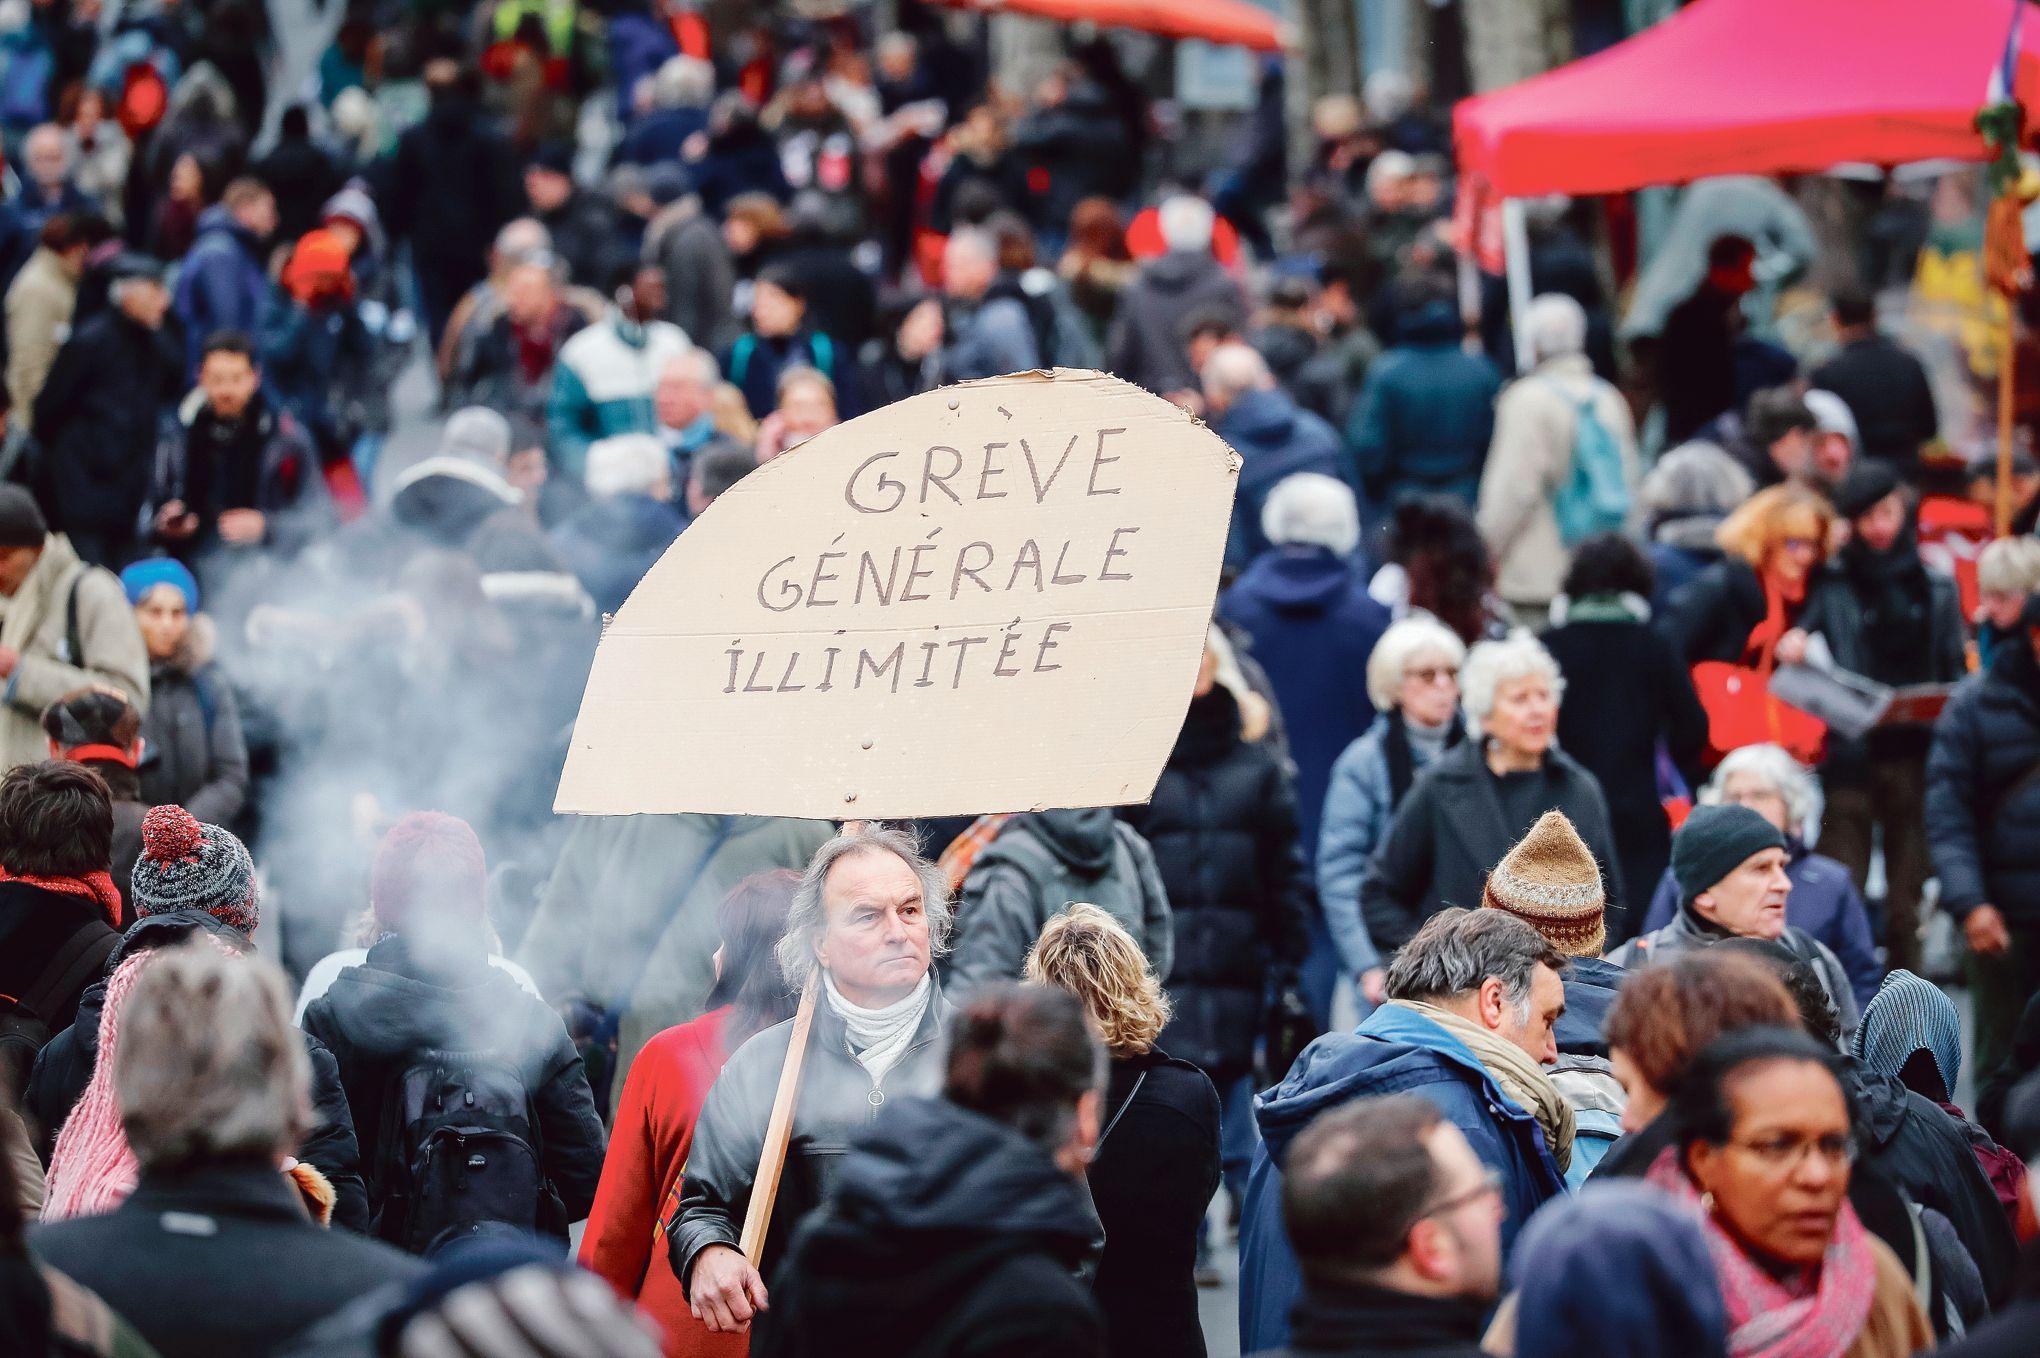 Calendrier Greve 2020.Greves Et Manifestations Un Calendrier Charge Pour Terminer L Annee